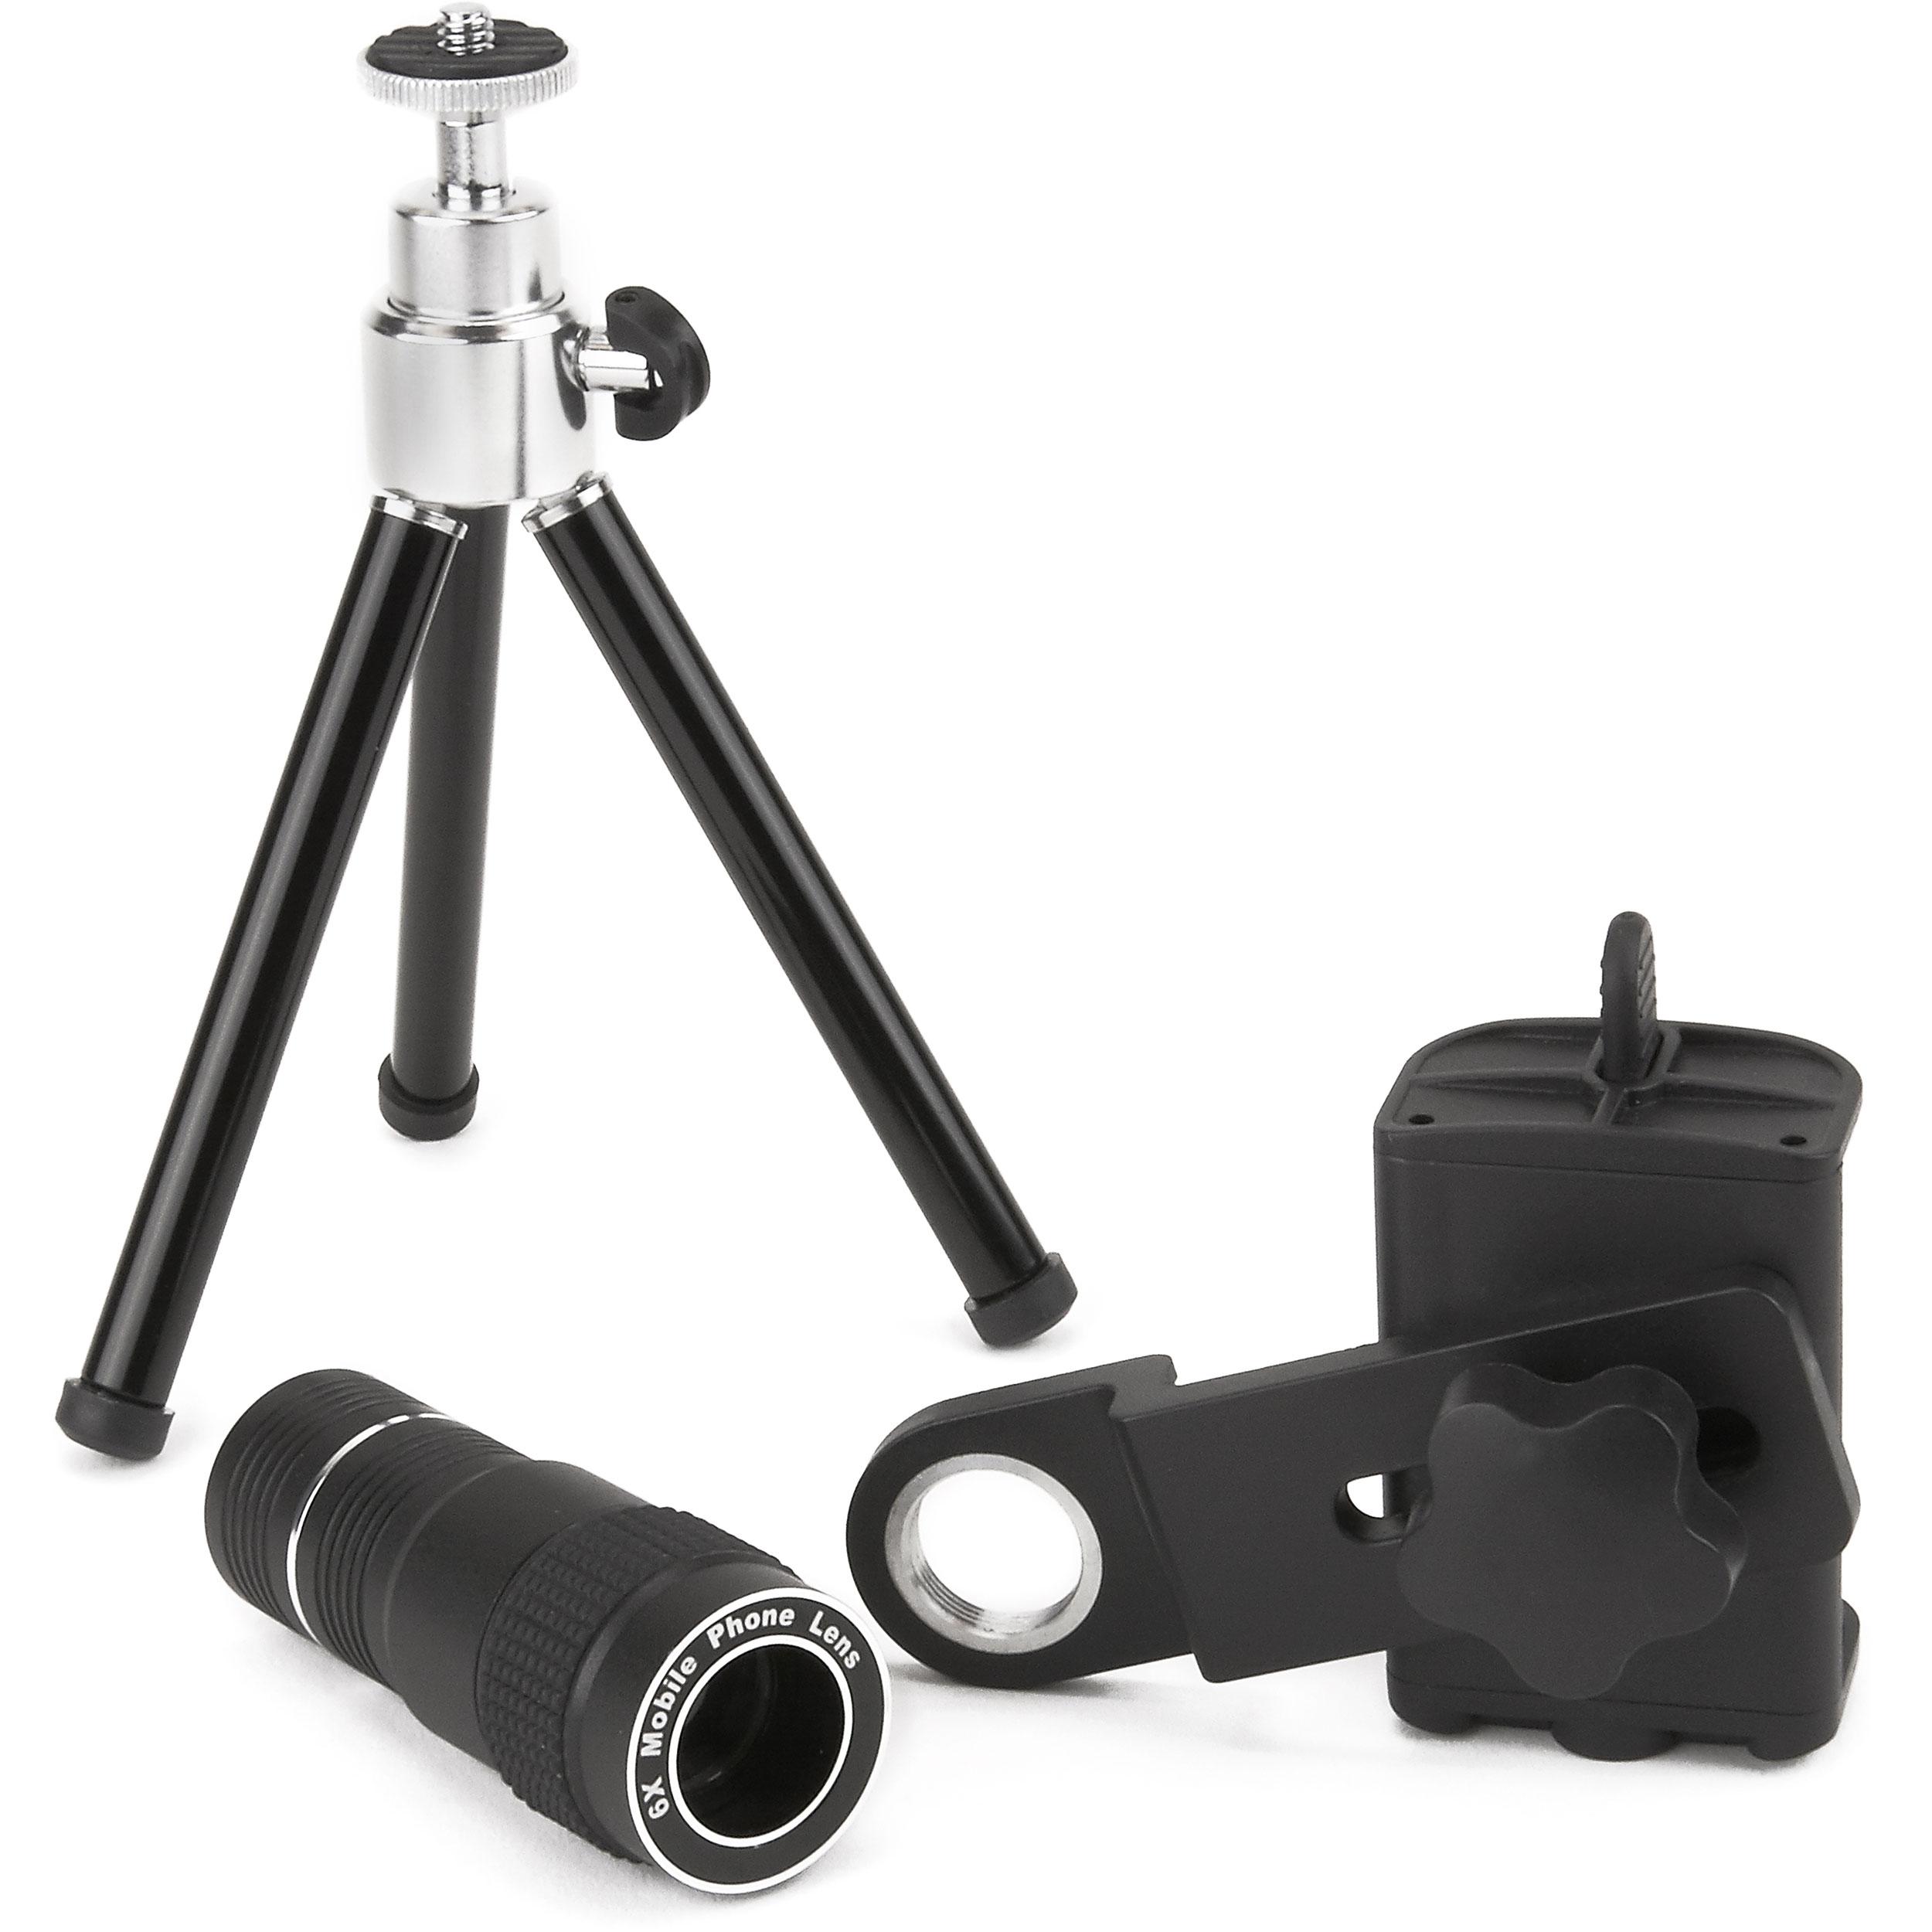 Carson Optical IC-918 HookUpz Smartphone Telephoto Lens, Adapter and Tripod